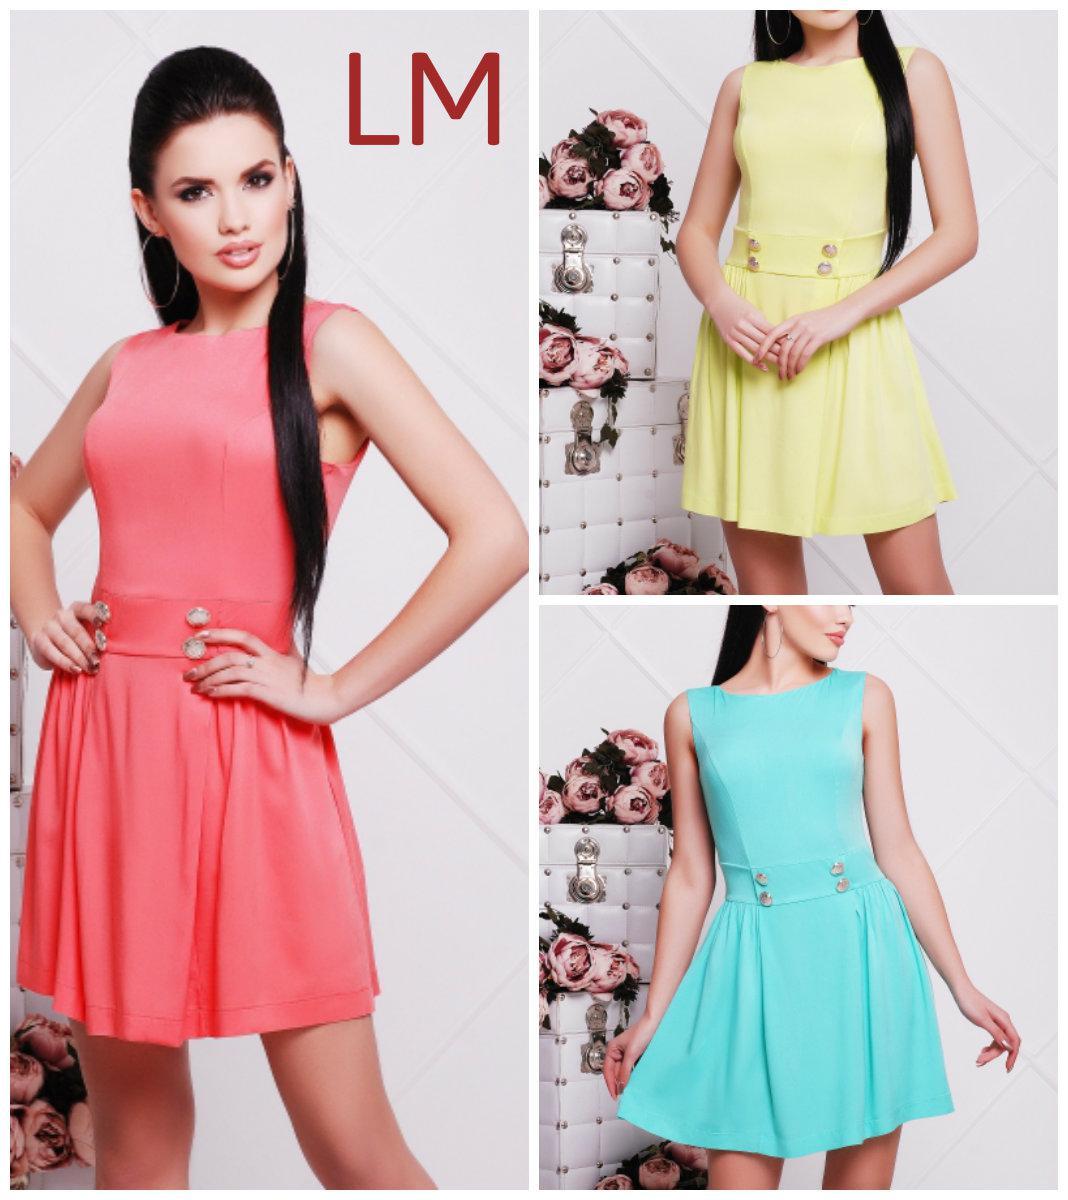 f6d8458dd2d4464 Размер 42,44,46,48,50 Женское летнее коралловое платье Даянака розовое